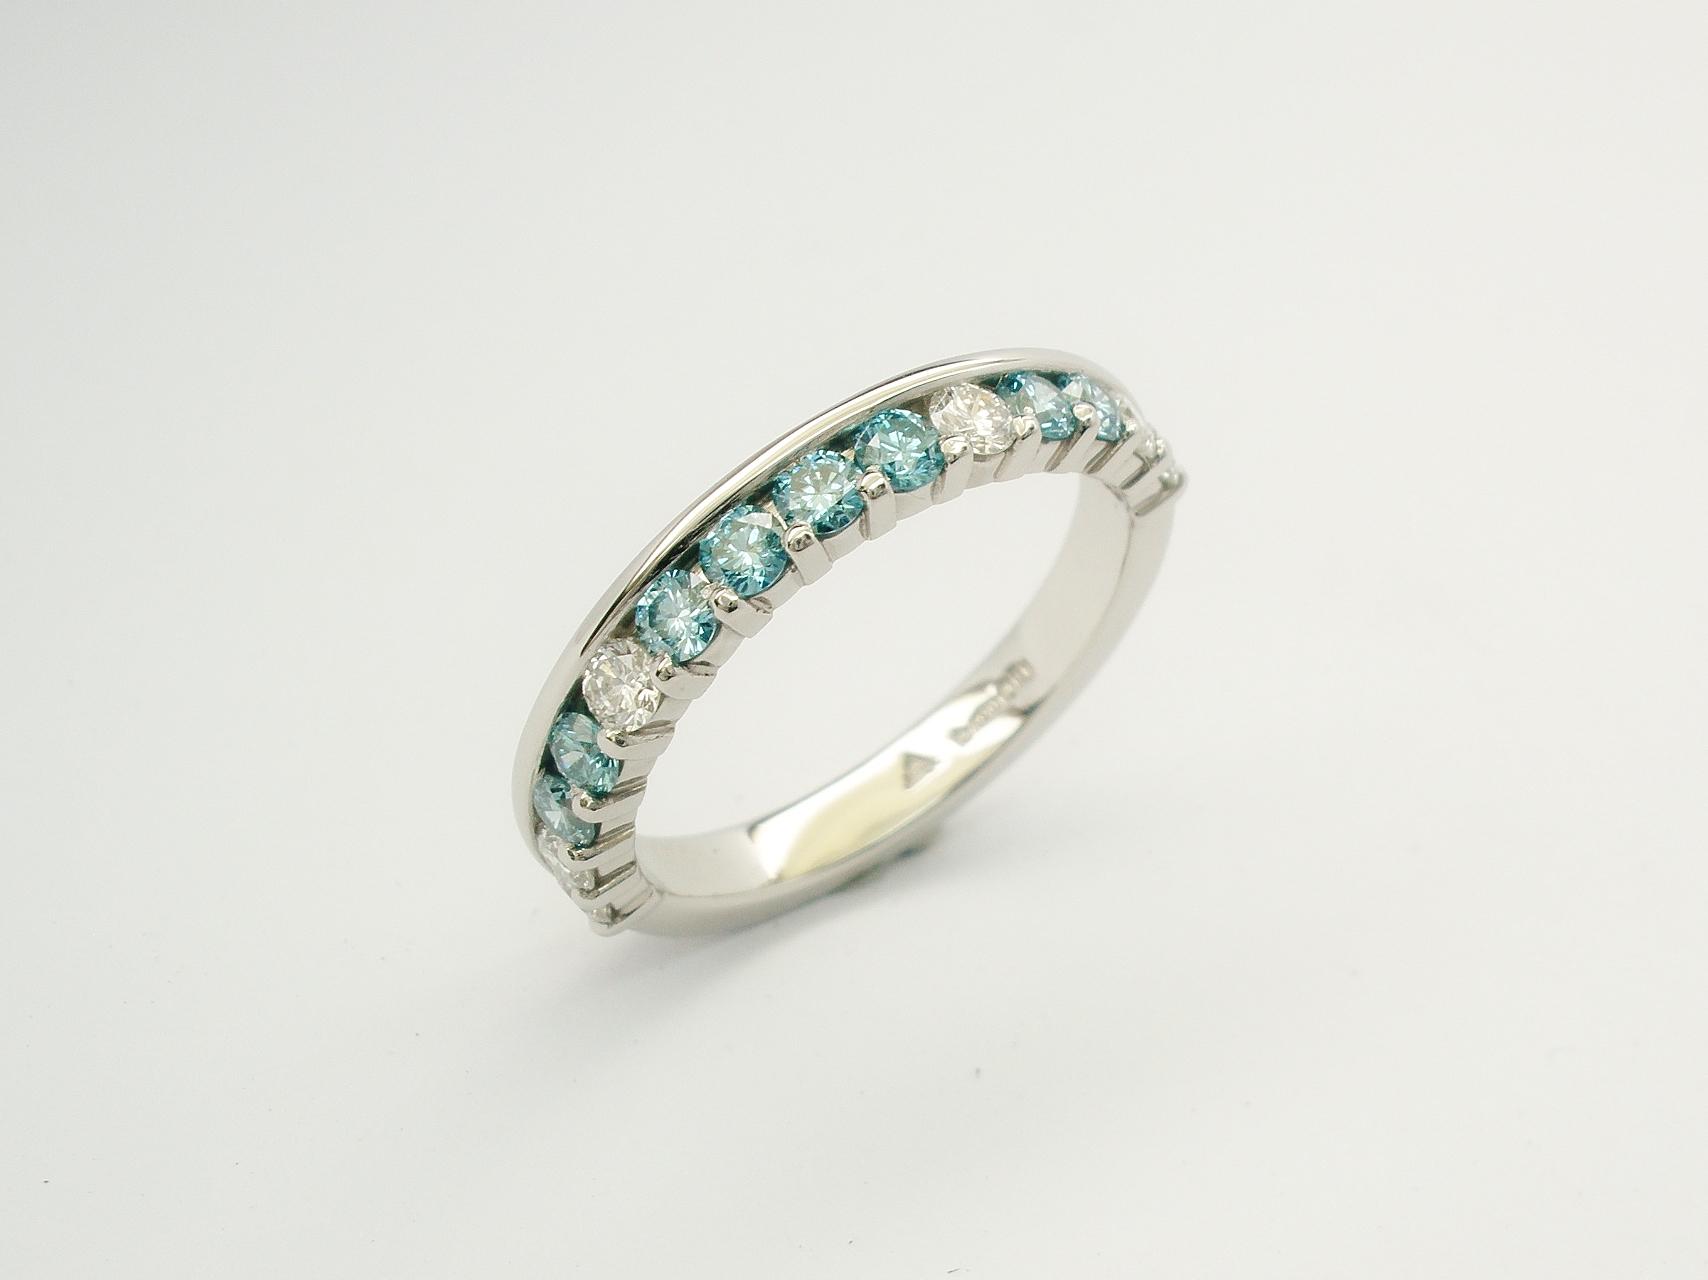 Platinum part channel set round brilliant cut sky blue diamond & white diamond wedding ring set to 55% cover.